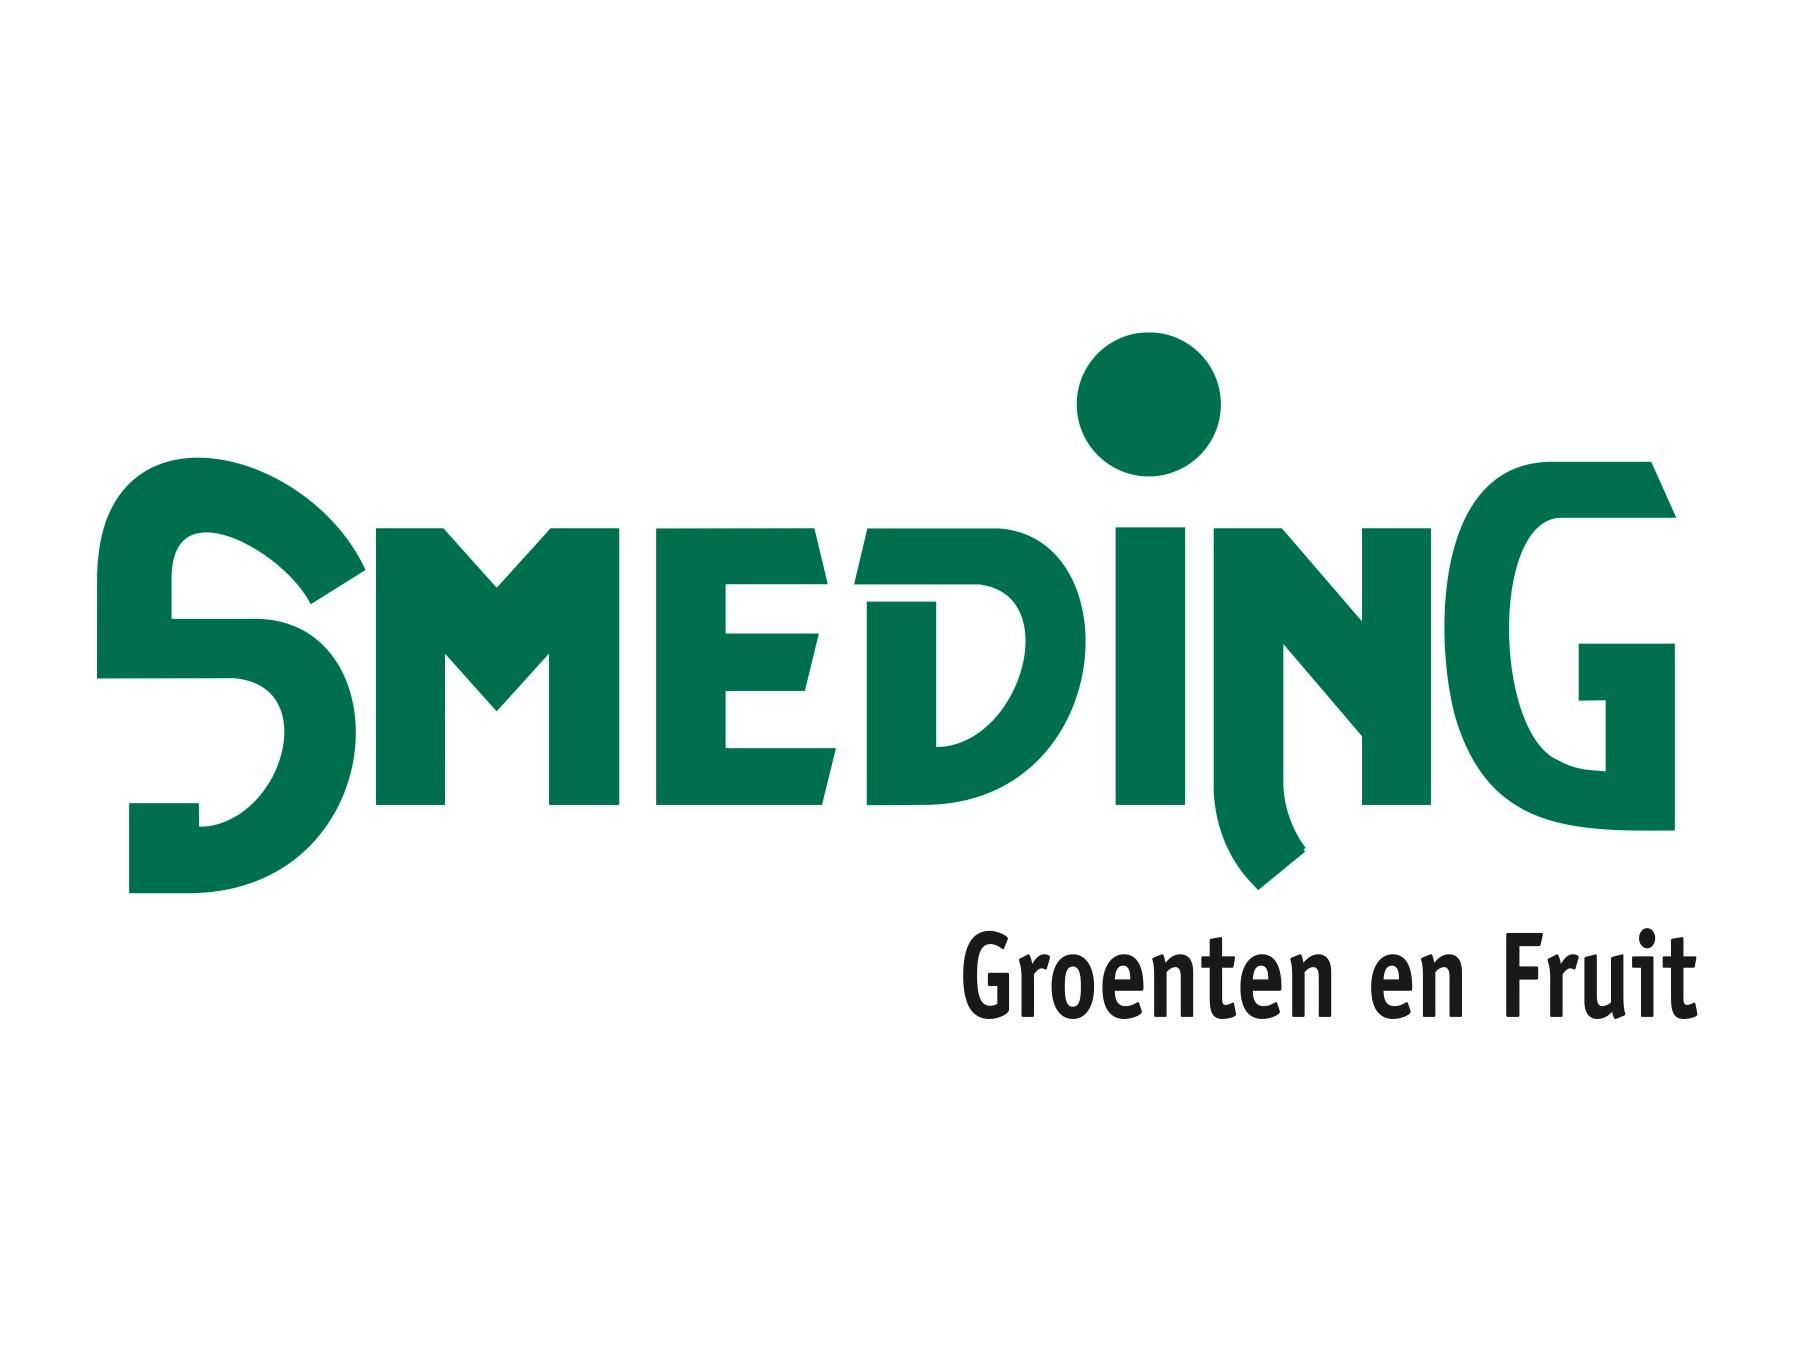 smeding_logo_groot3-4